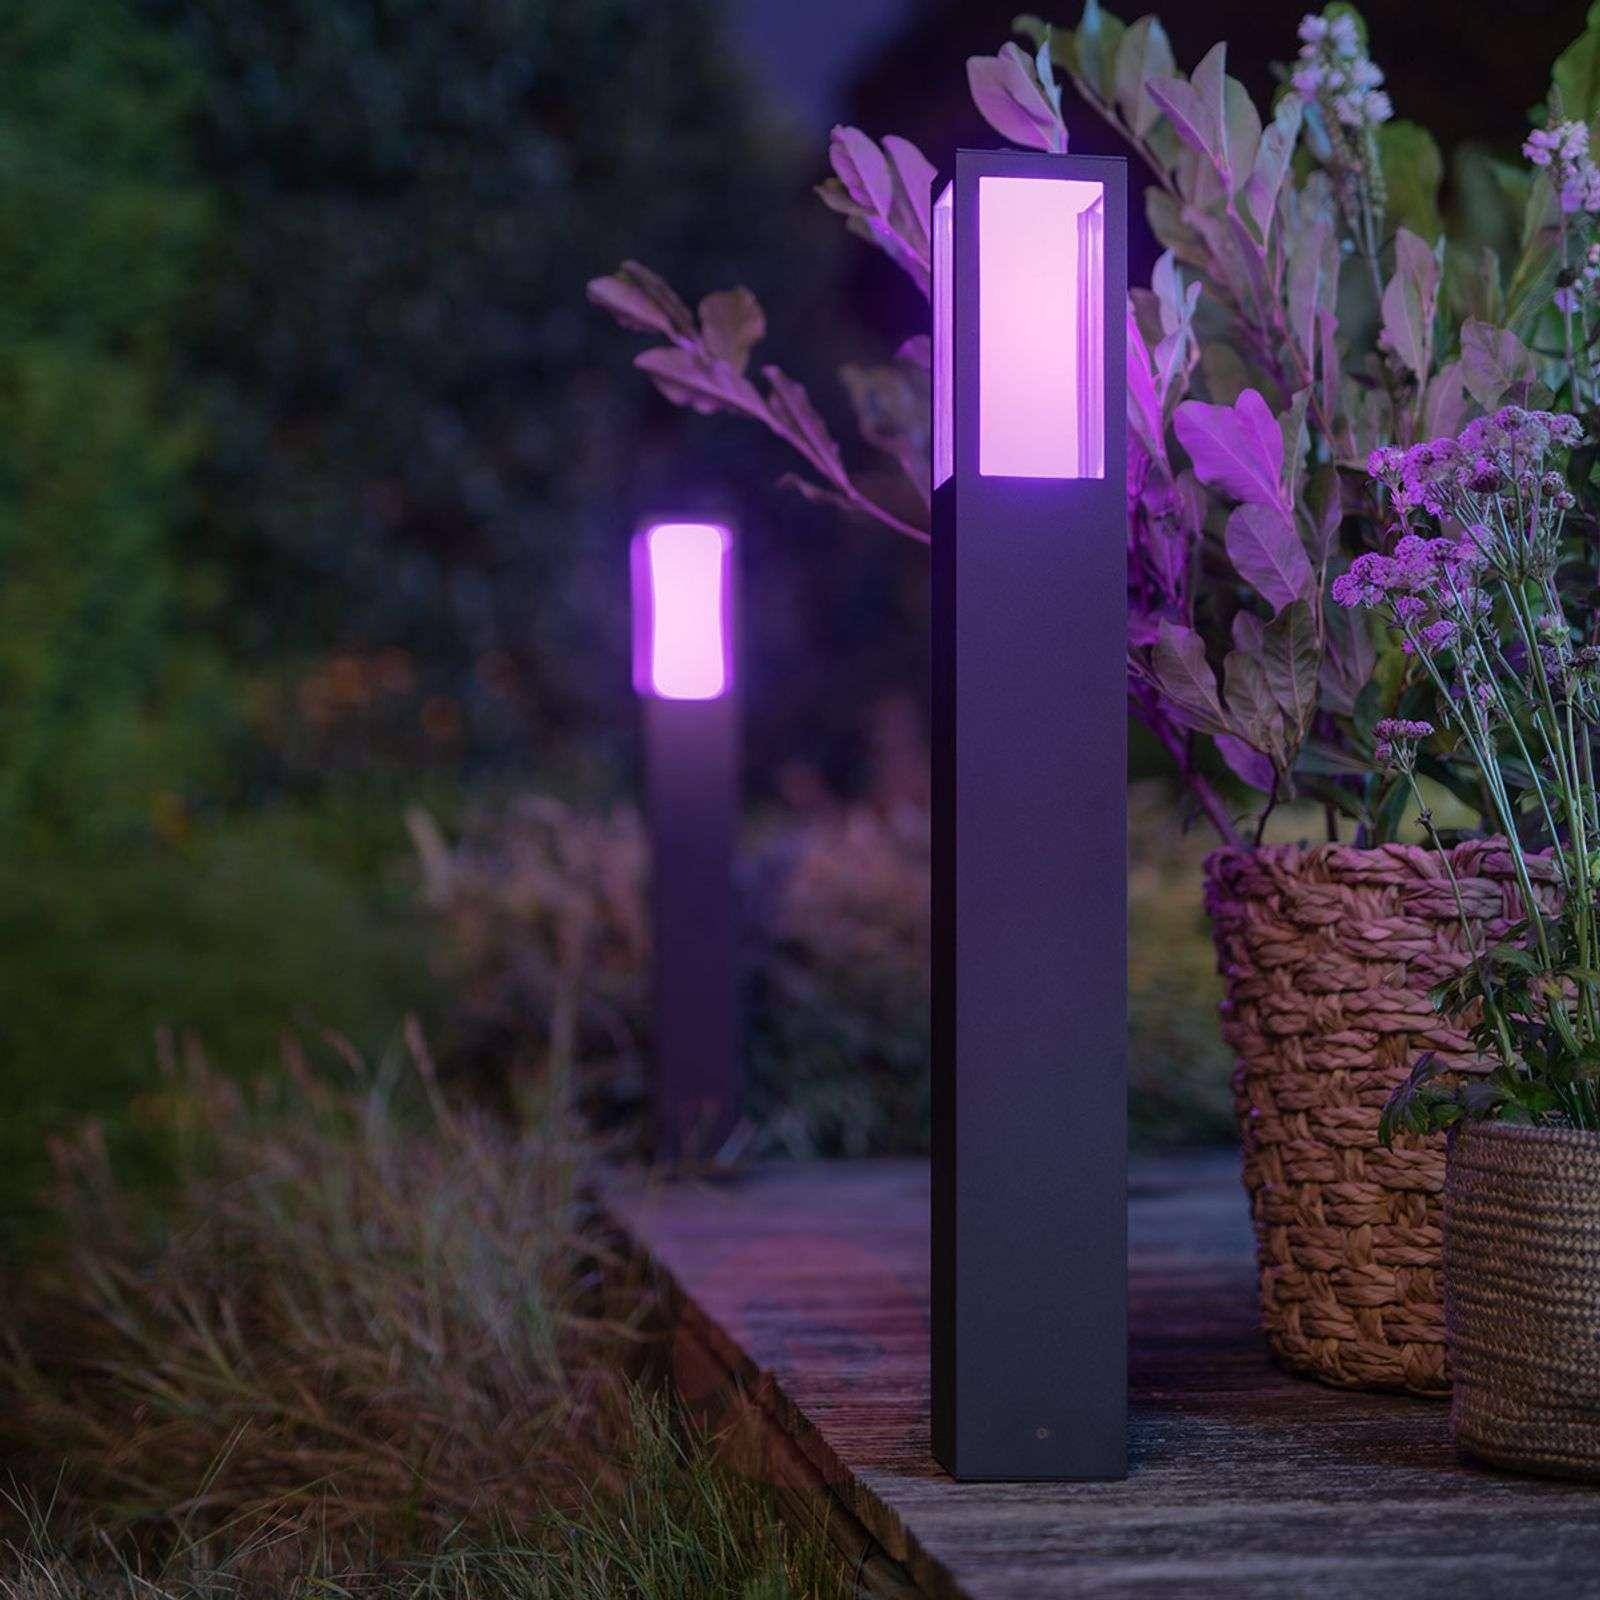 Philips Hue White Color Impress Led Path Light Lights Ie